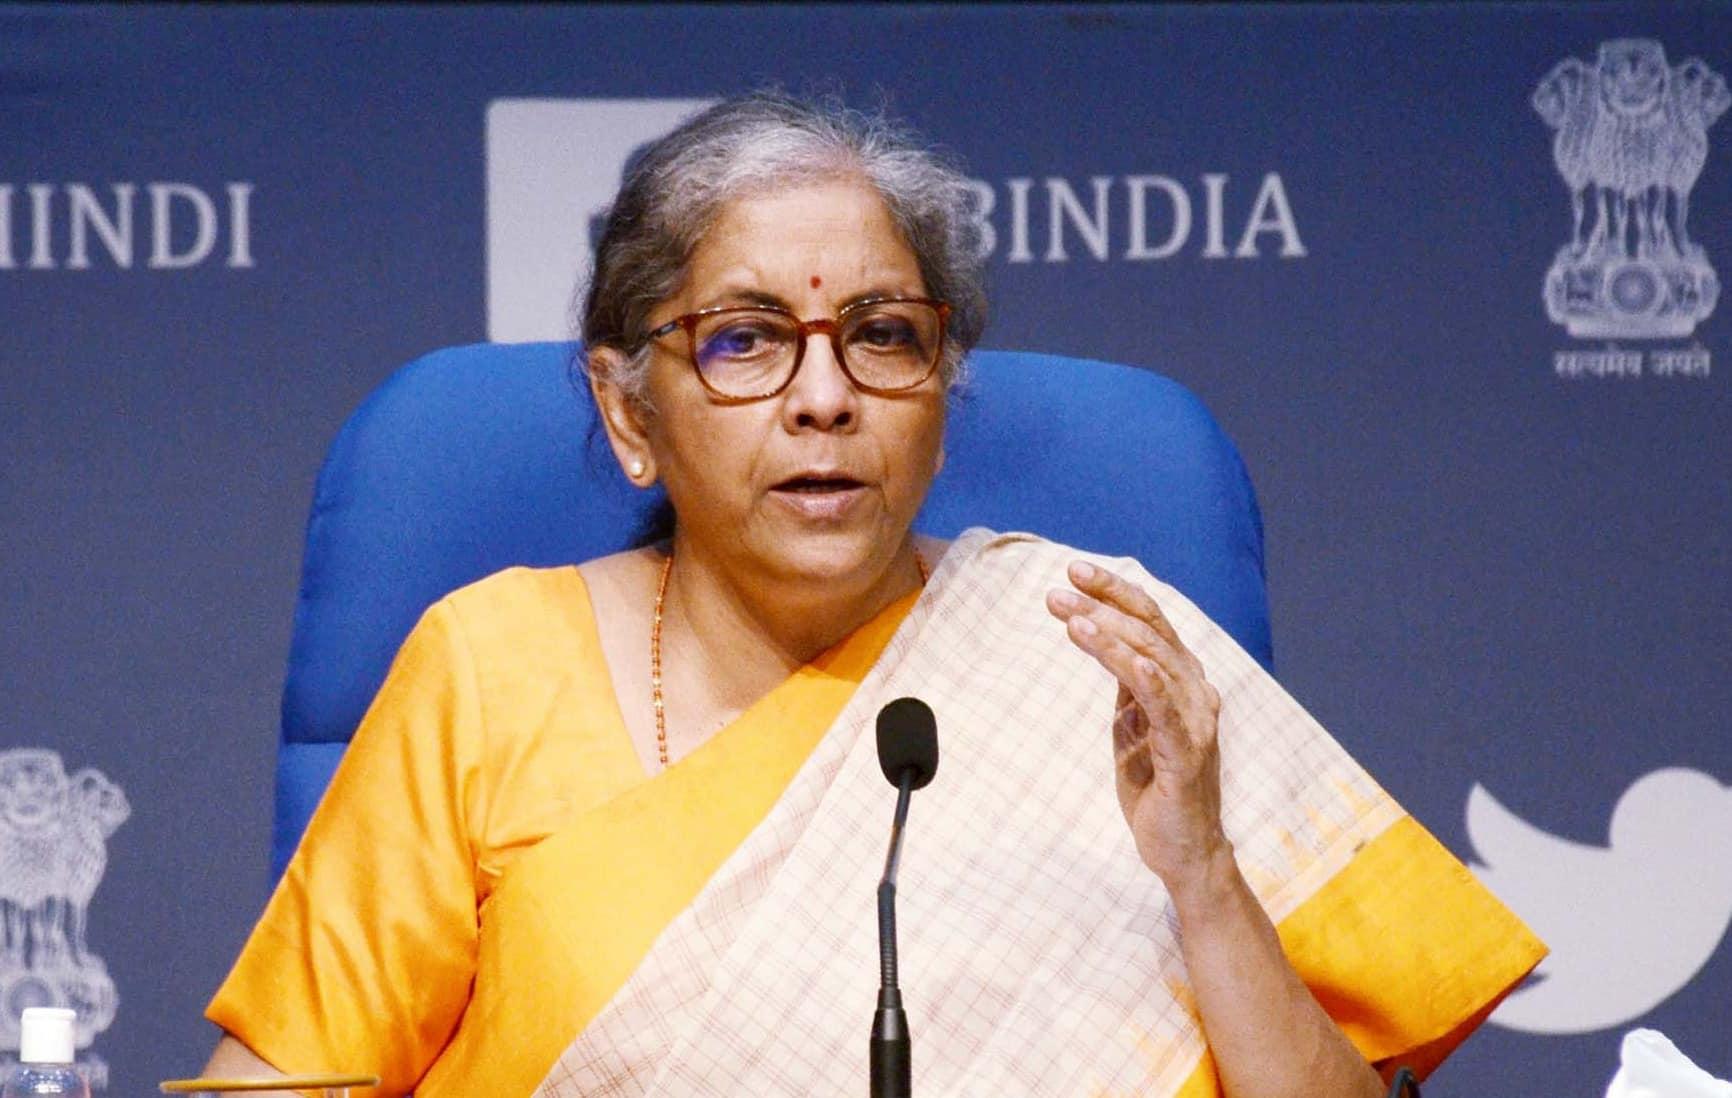 Smt._Nirmala_Sitharaman_Minister_of_Finance